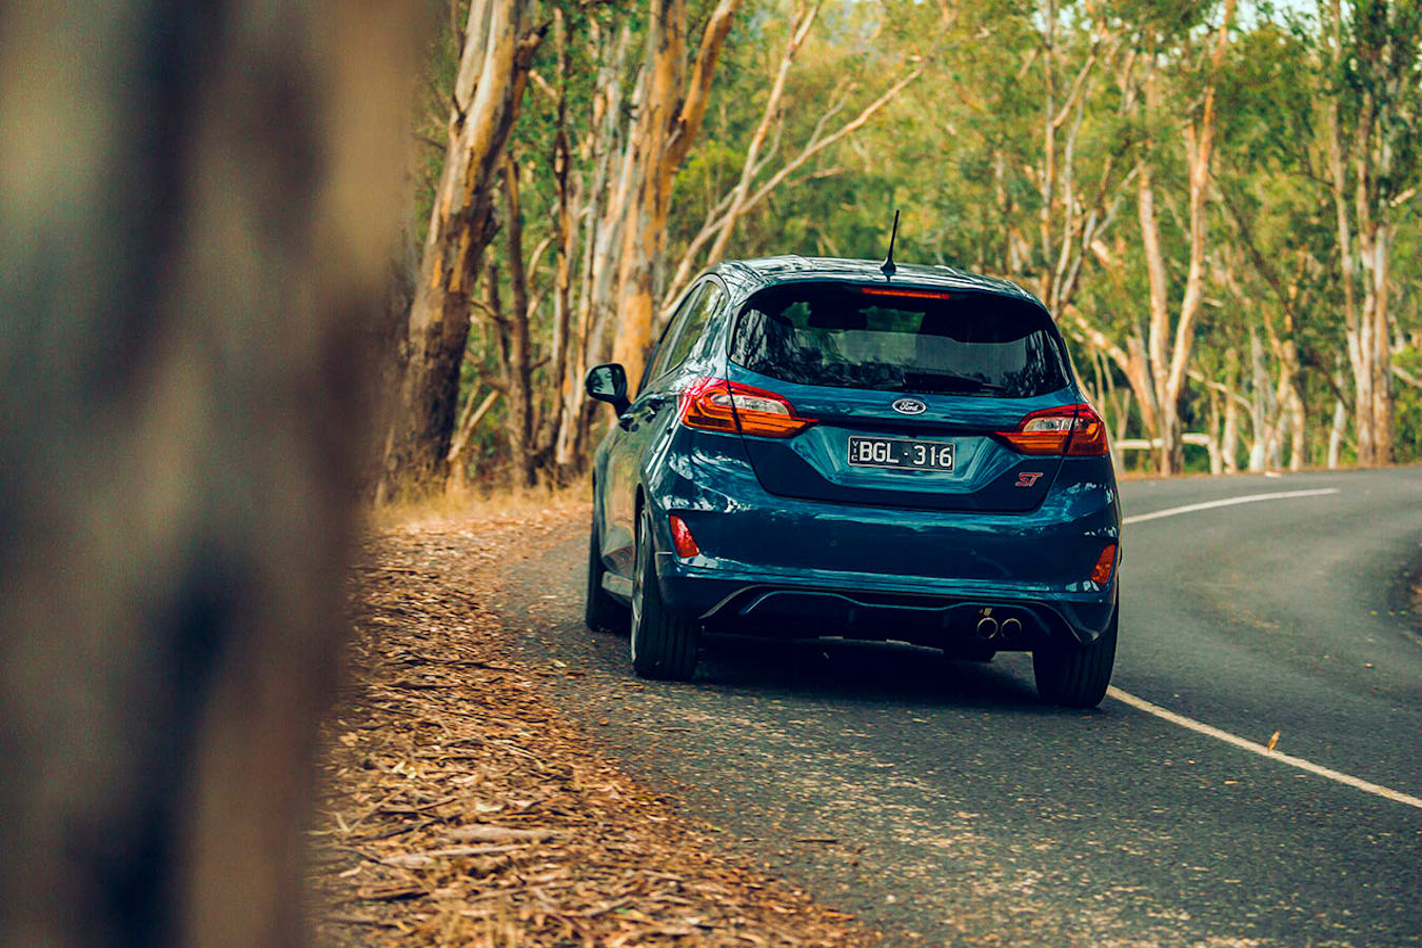 Ford Fiesta driving rear